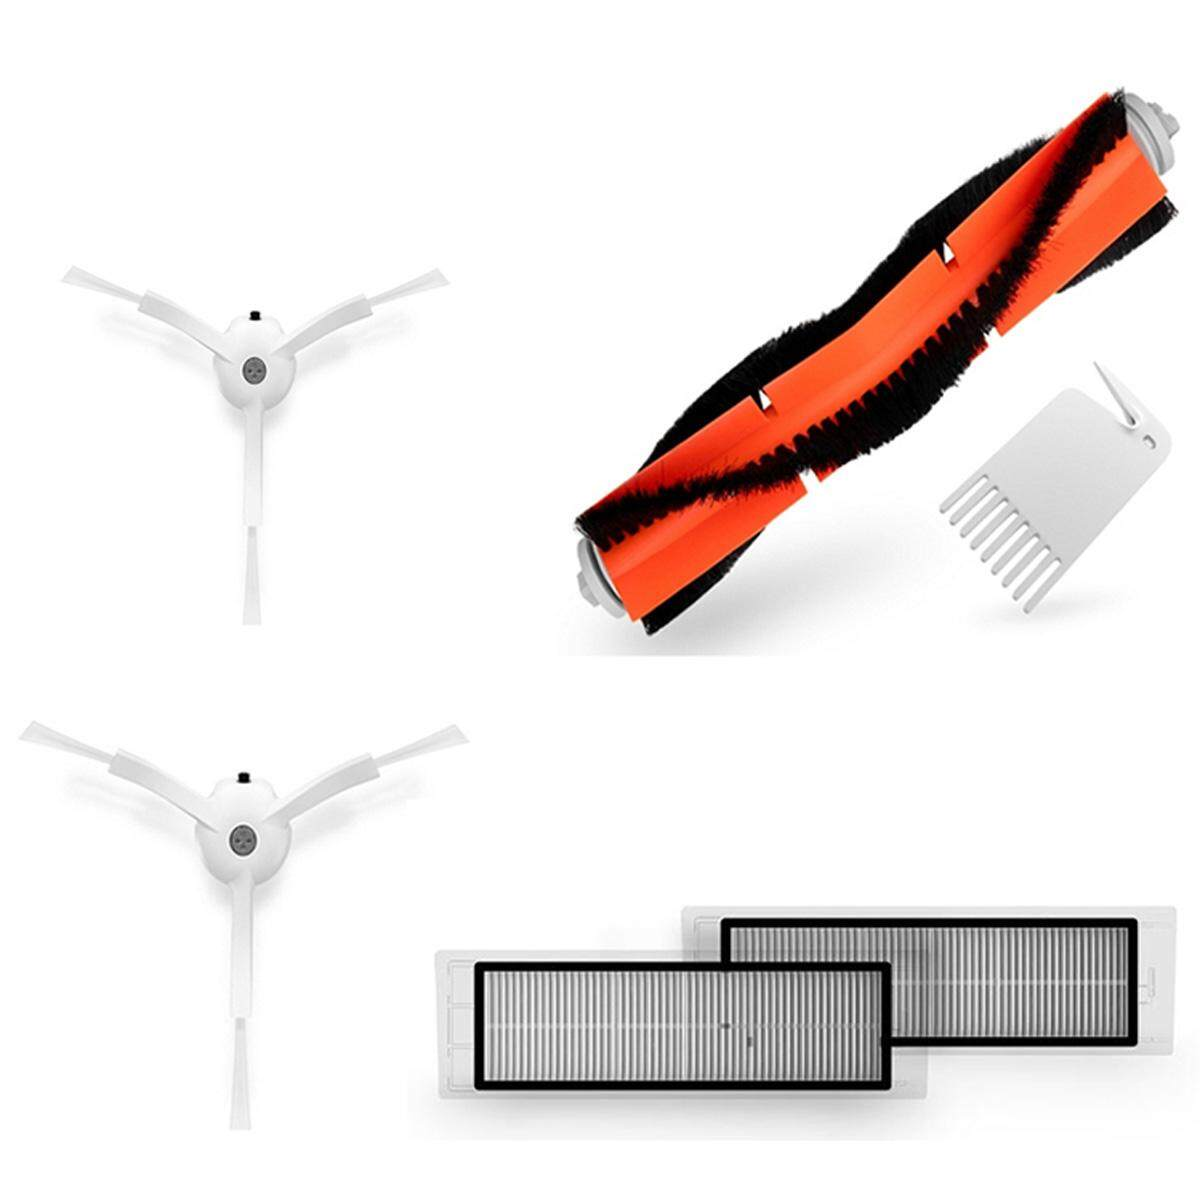 Sale Original Xiaomi Robot Vacuum Cleaner Part Pack Accessories Kit Intl Xiaomi Cheap